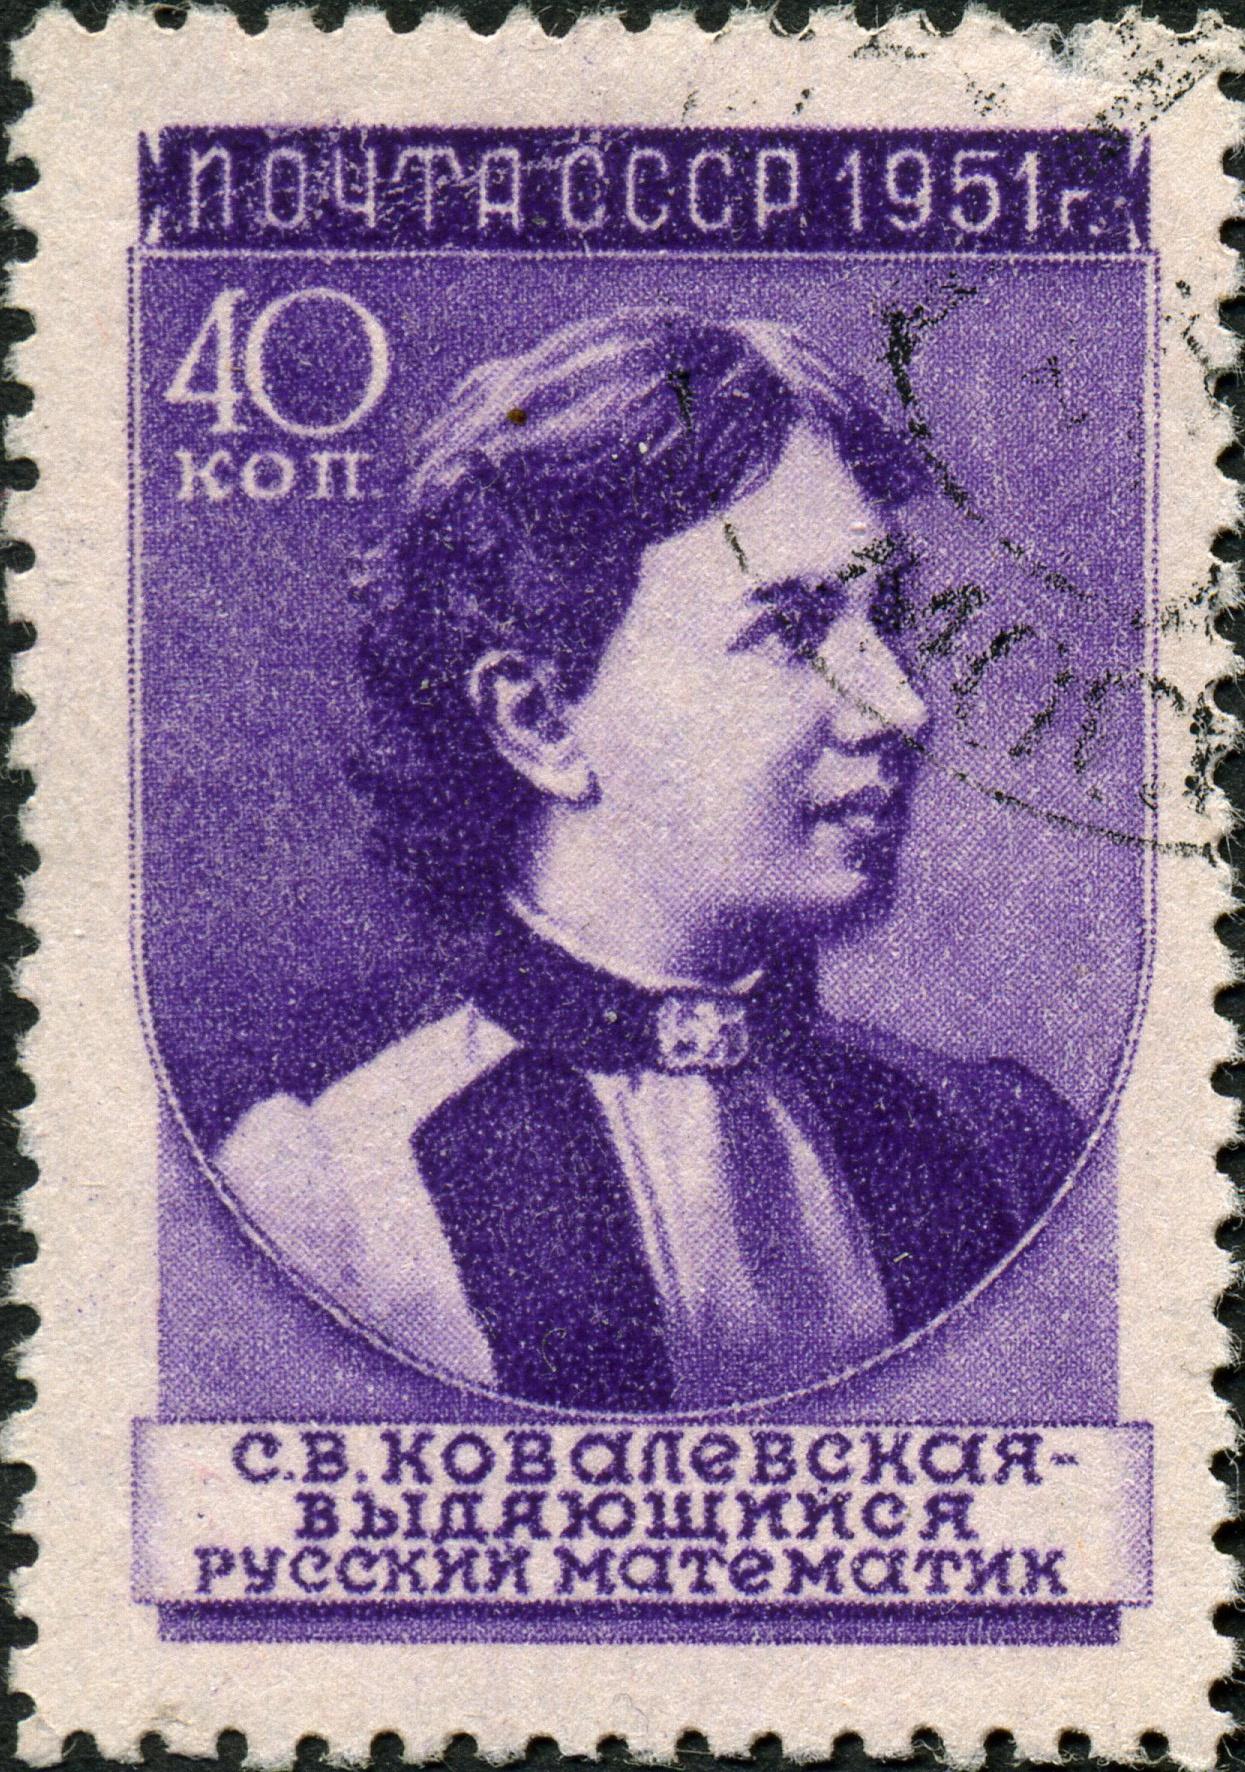 Pioneering female mathematician Sofia Kovalevskaya on a Soviet Union postage stamp in 1951.